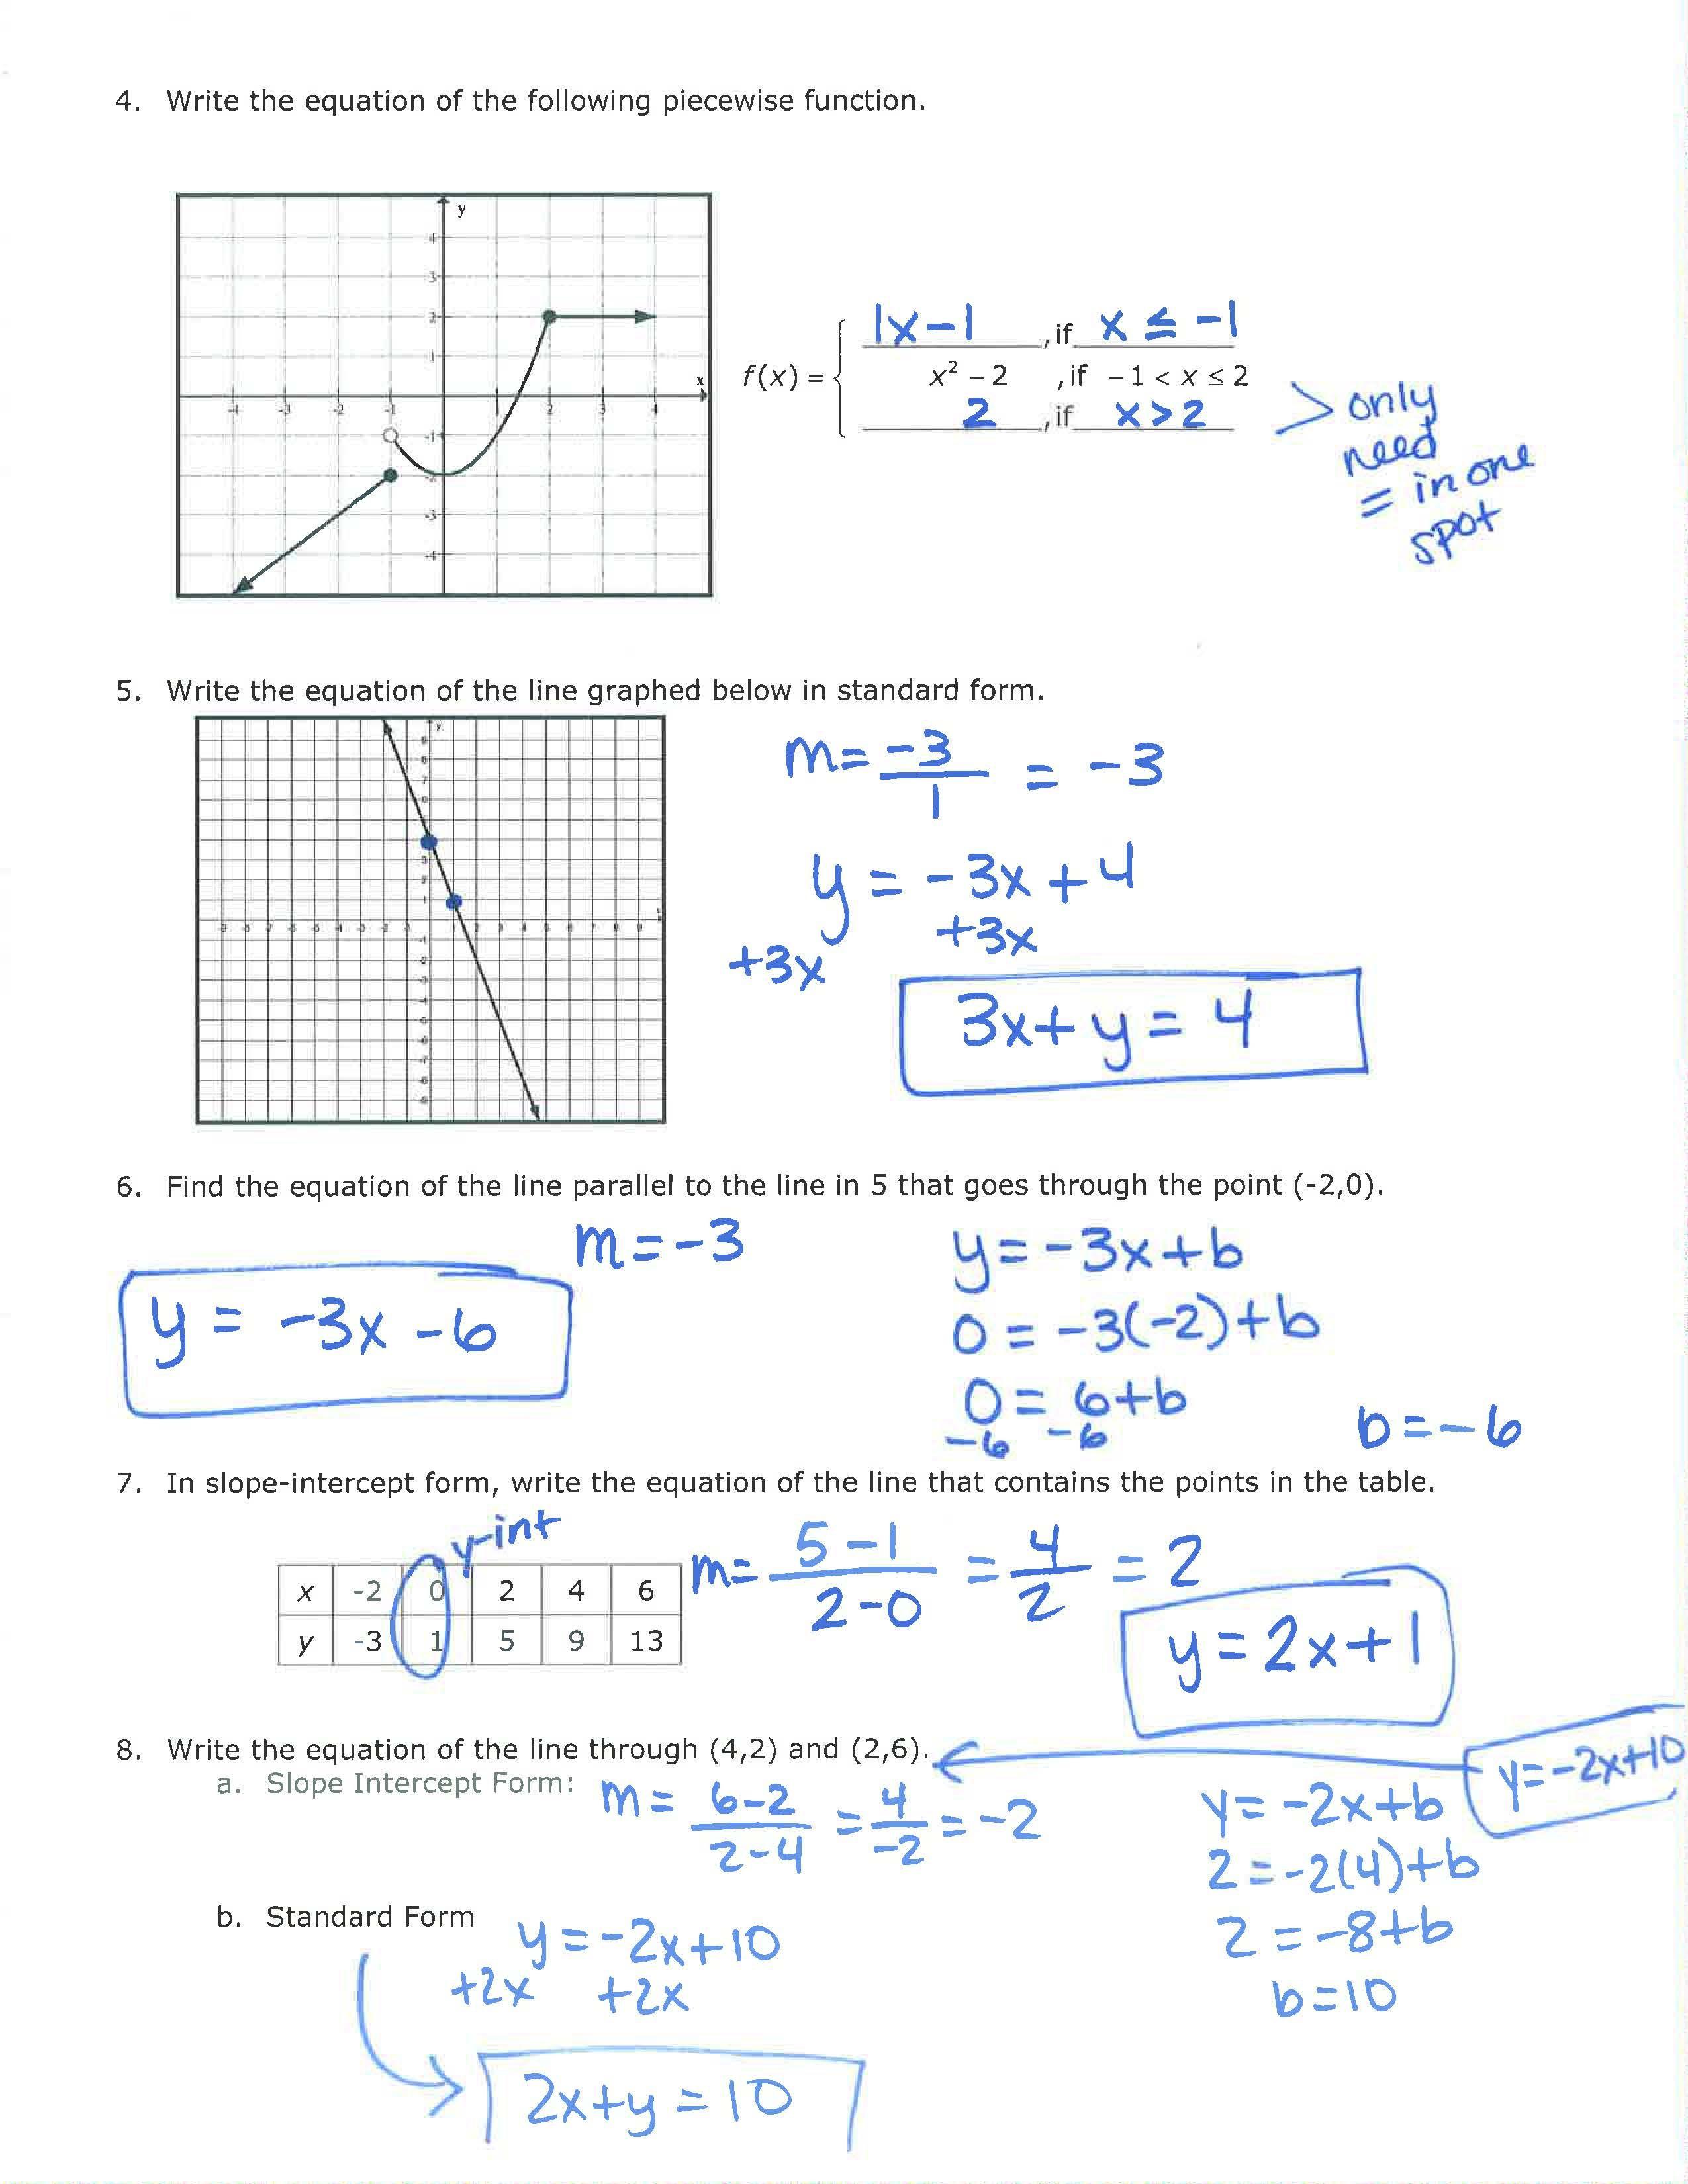 Unit 1 Page 2 Review Answers | Algebra 2 Keys | Algebra, Algebra 2 - Algebra 2 Crossword Puzzles Printable